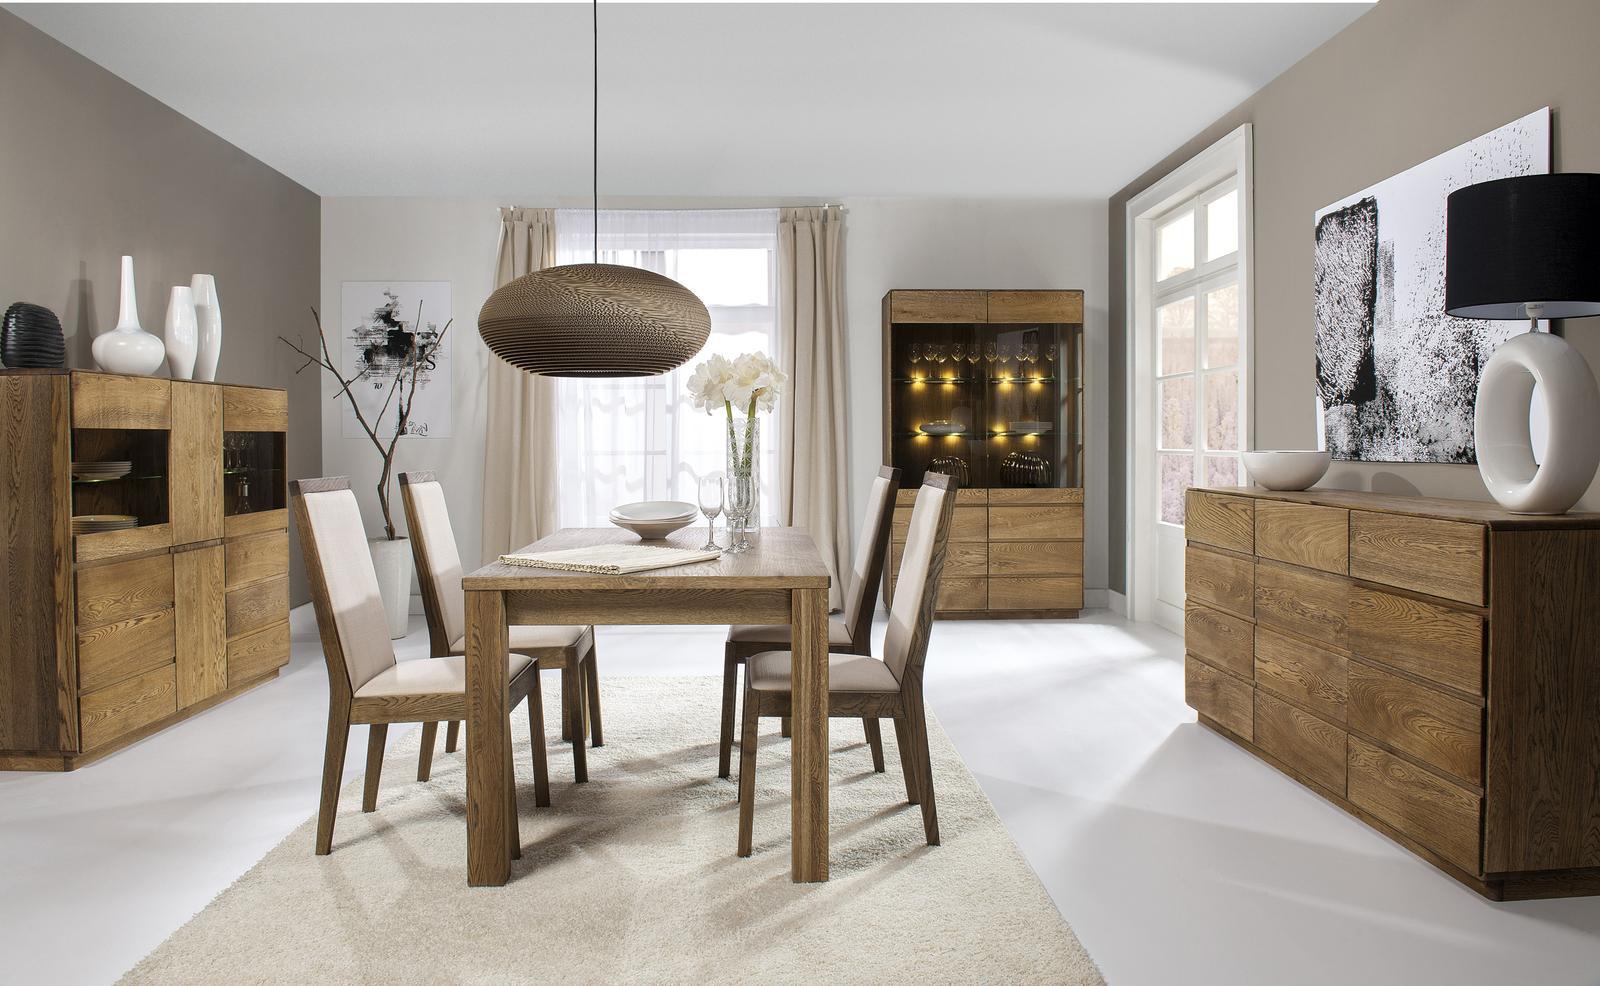 Dubový nábytok do obývačky... - Obrázok č. 1